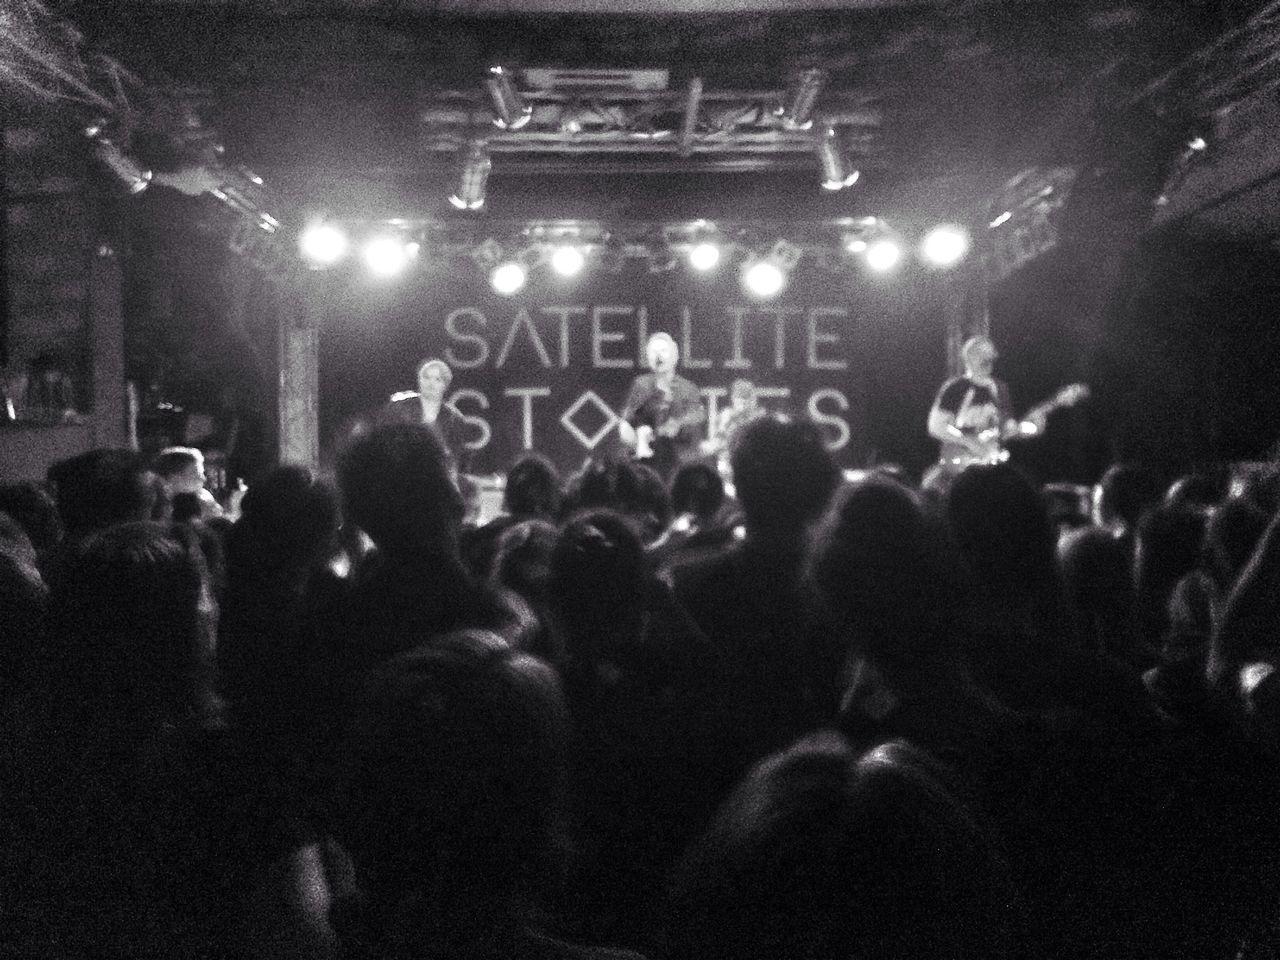 Satellite Story Berlin Concert Frannzclub Blackandwhite